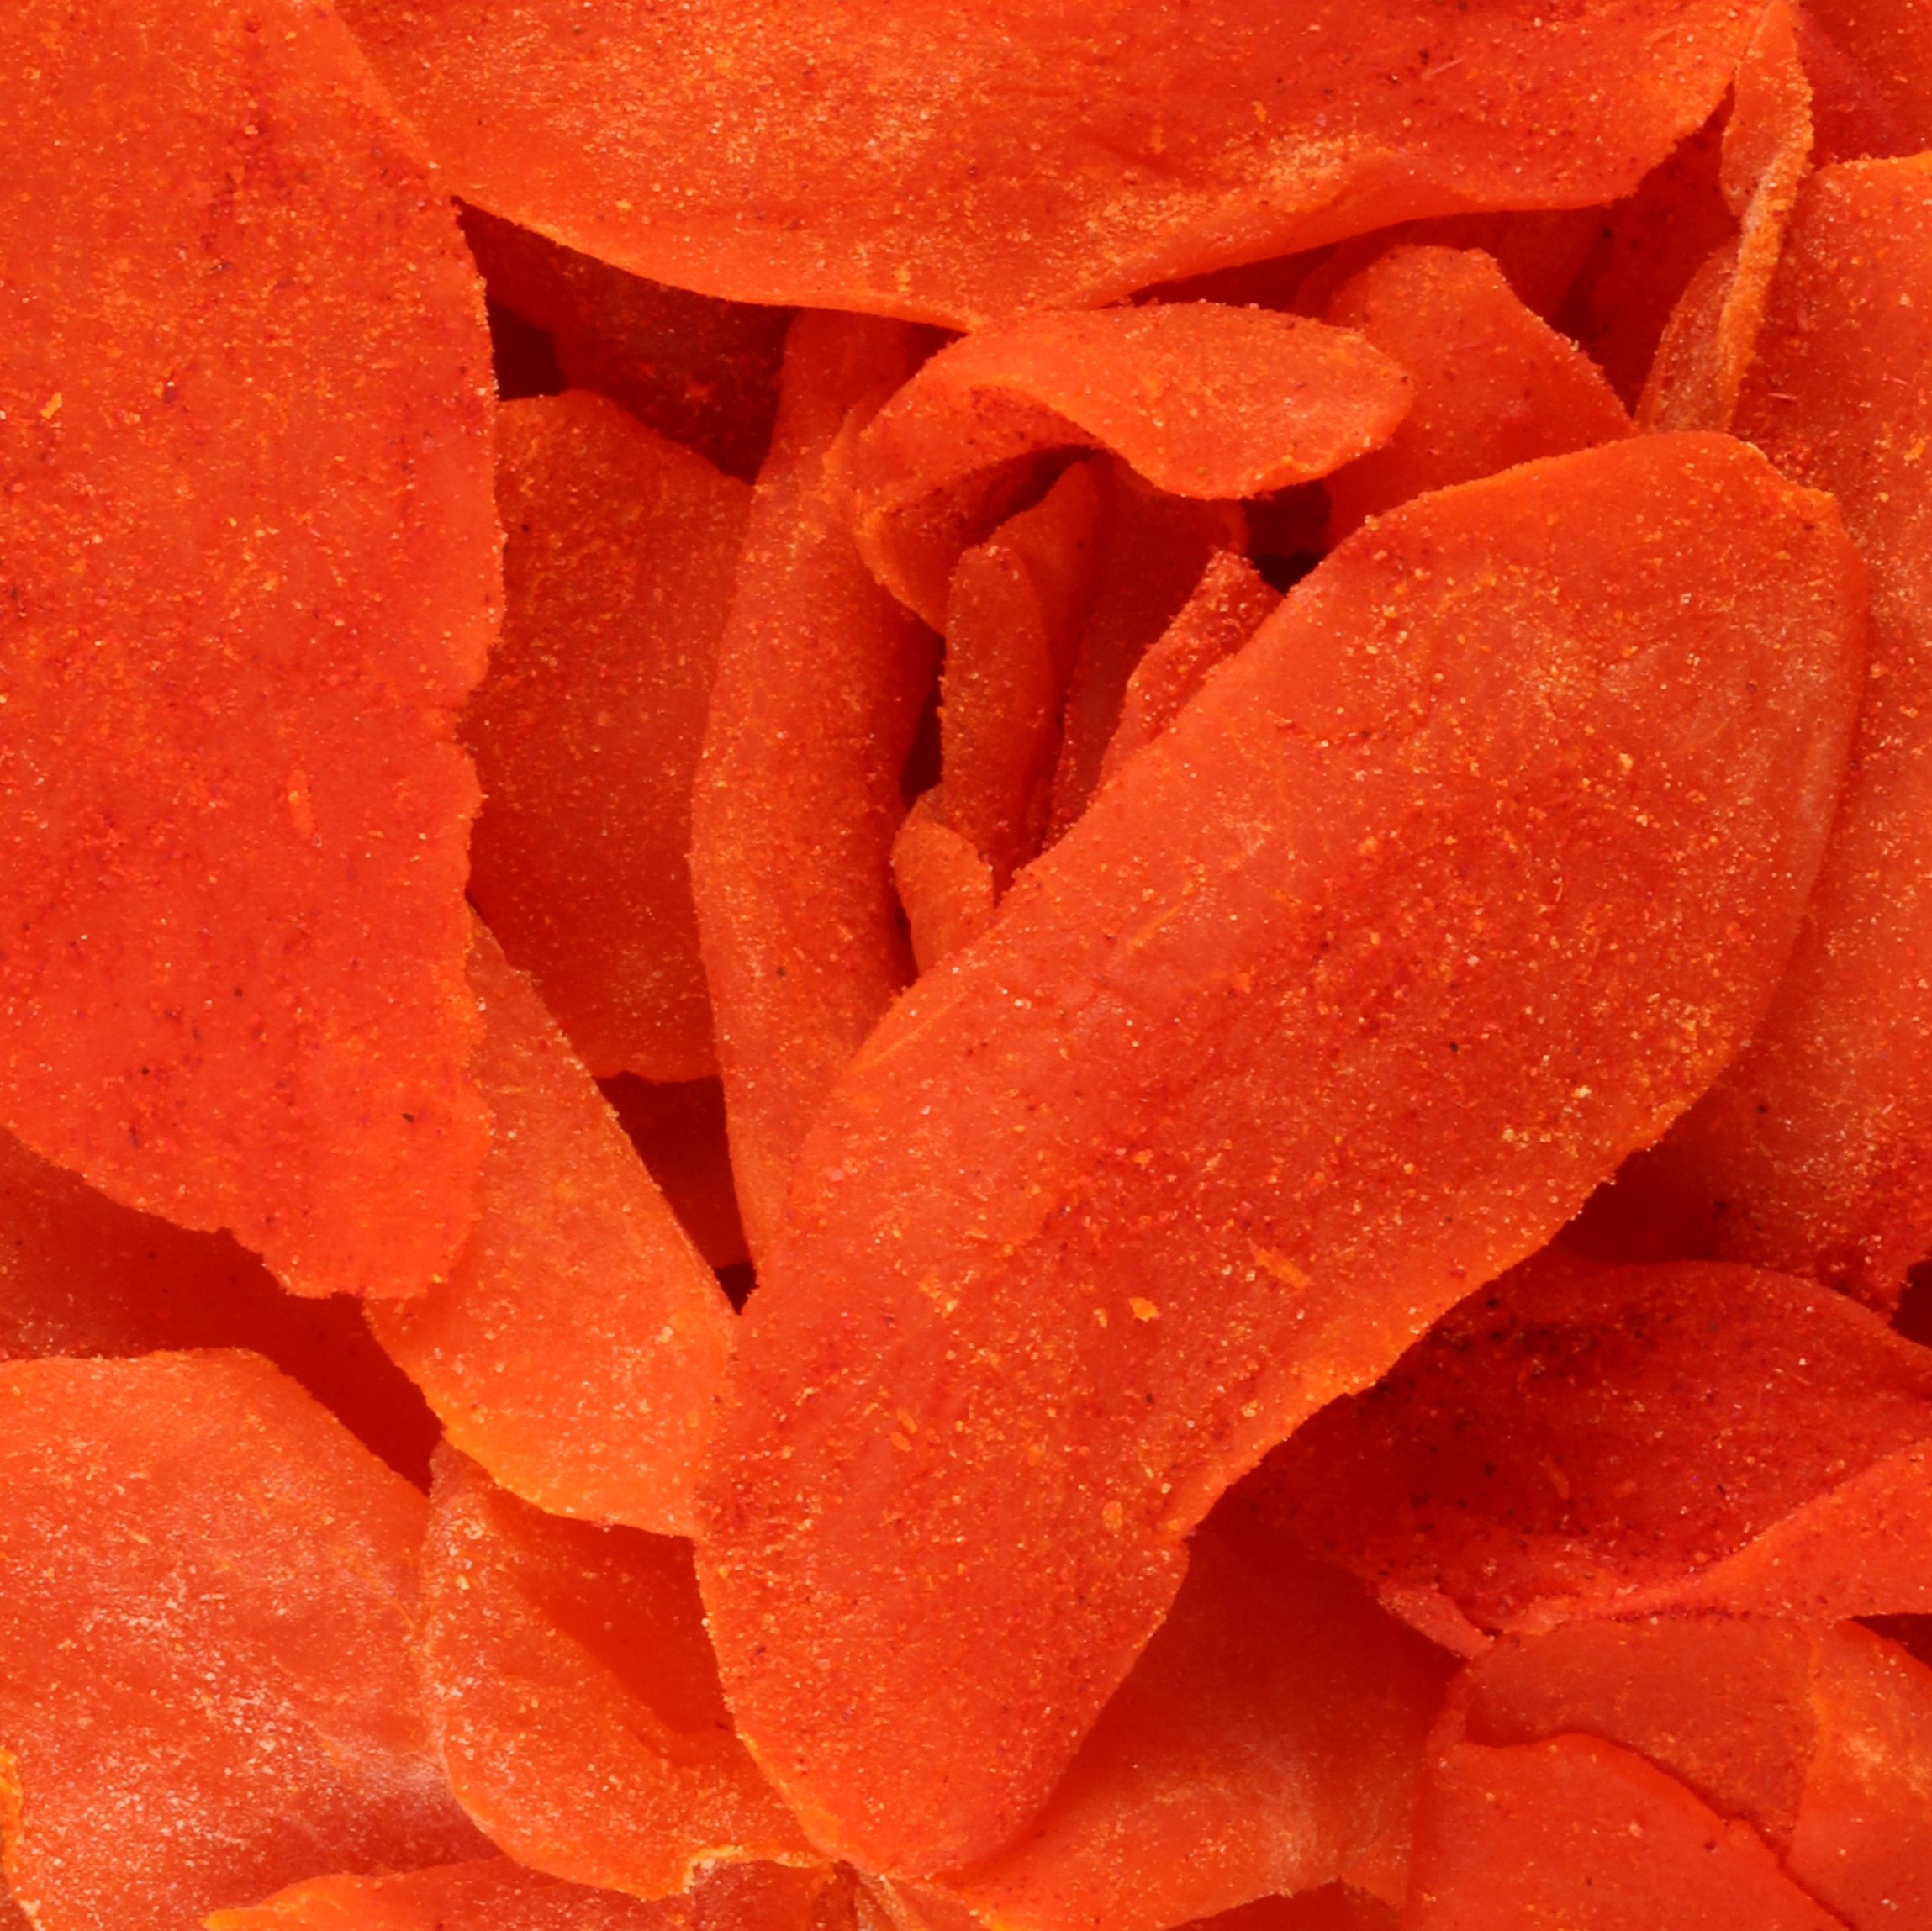 Li Hing Mui Mango - 8 ounce bag - Sweet Dried Ripe Mango sprinkled with Li Hing Mui (plum) powder